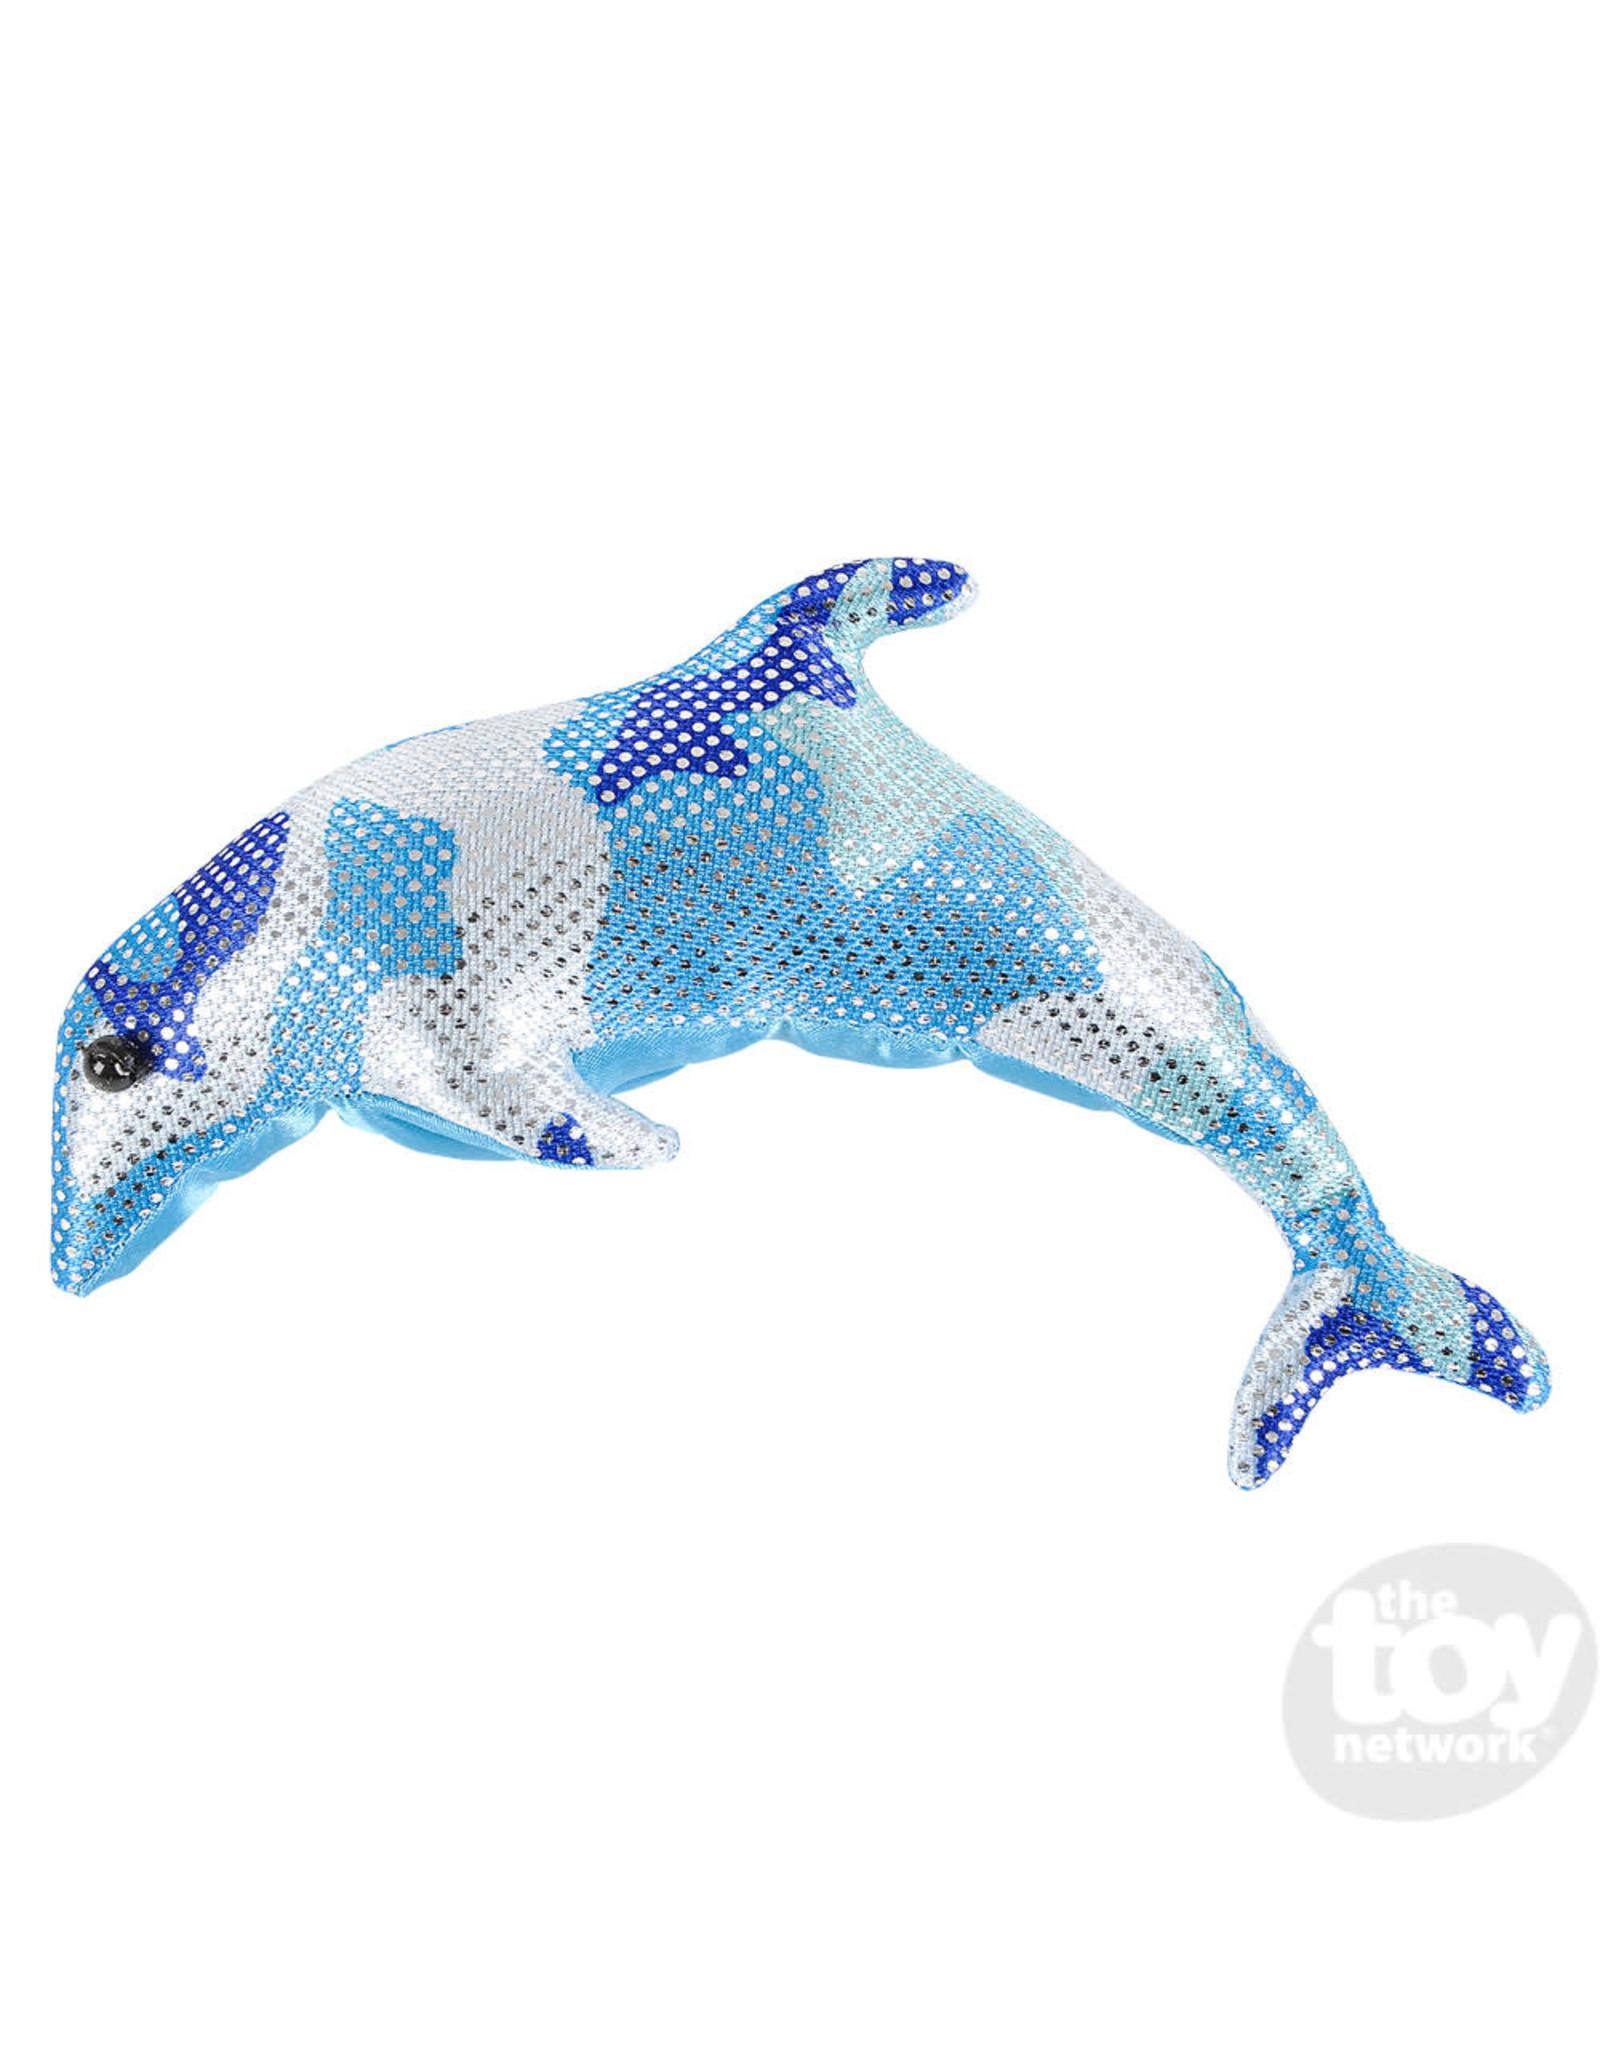 The Toy Network Dolphin Sandbag